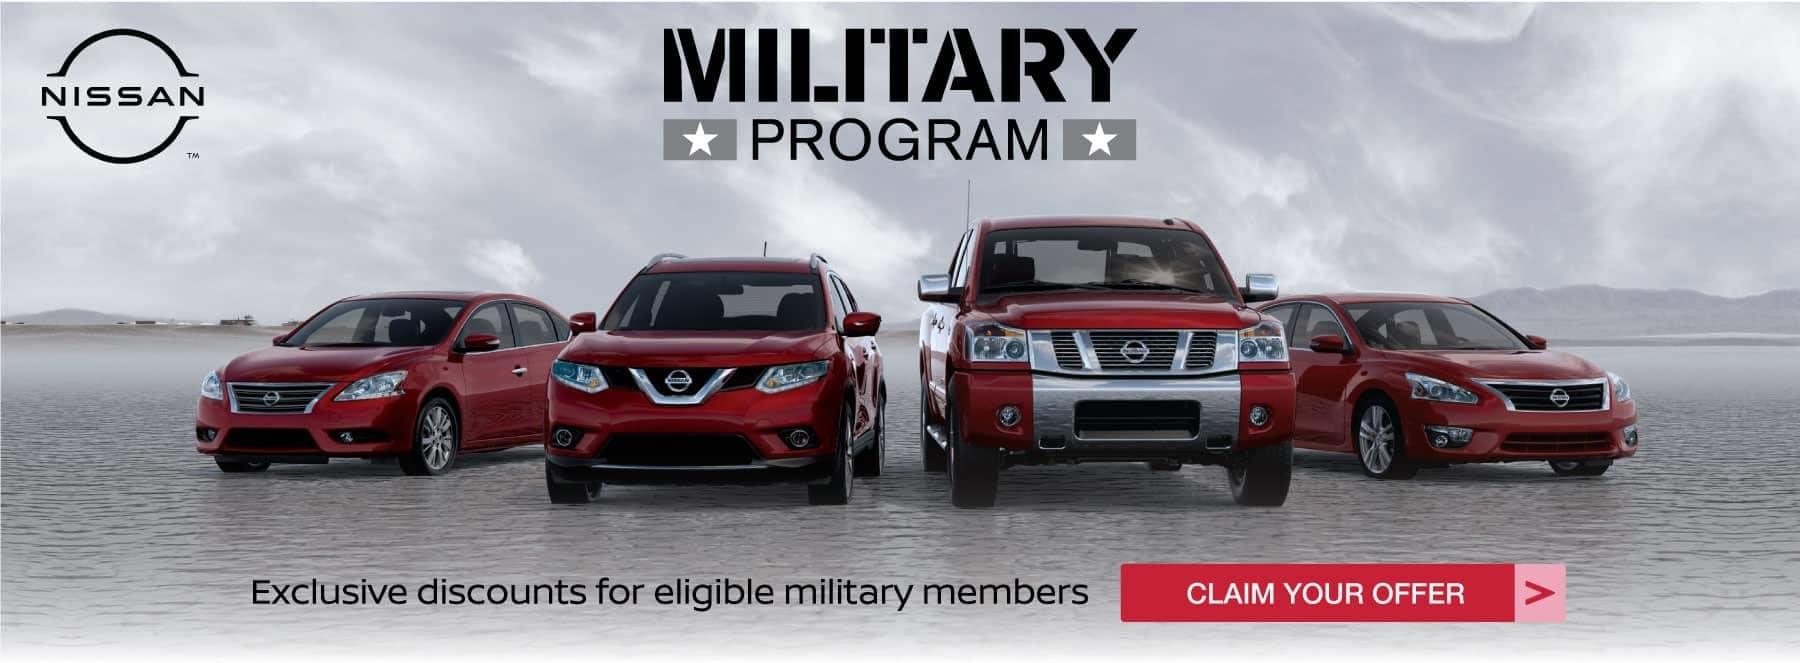 Nissan_Military_Program-DI